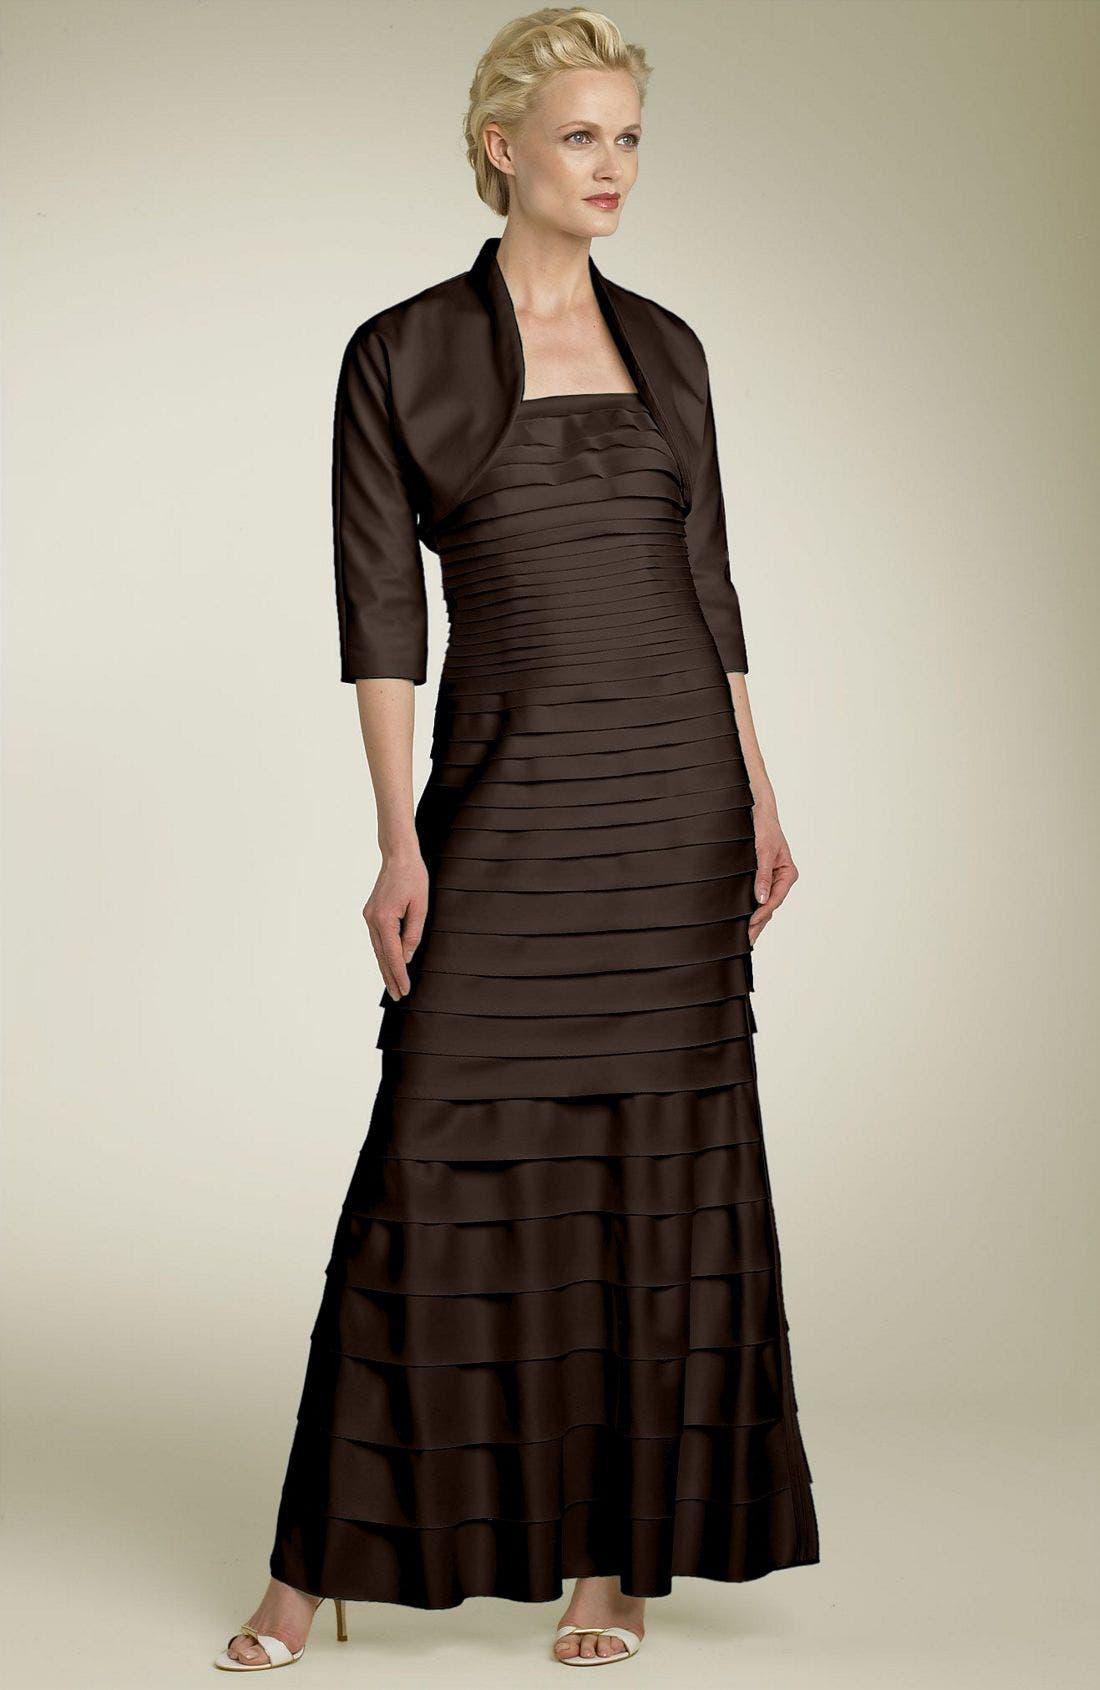 Main Image - JS Collections Laser Cut Dress & Bolero